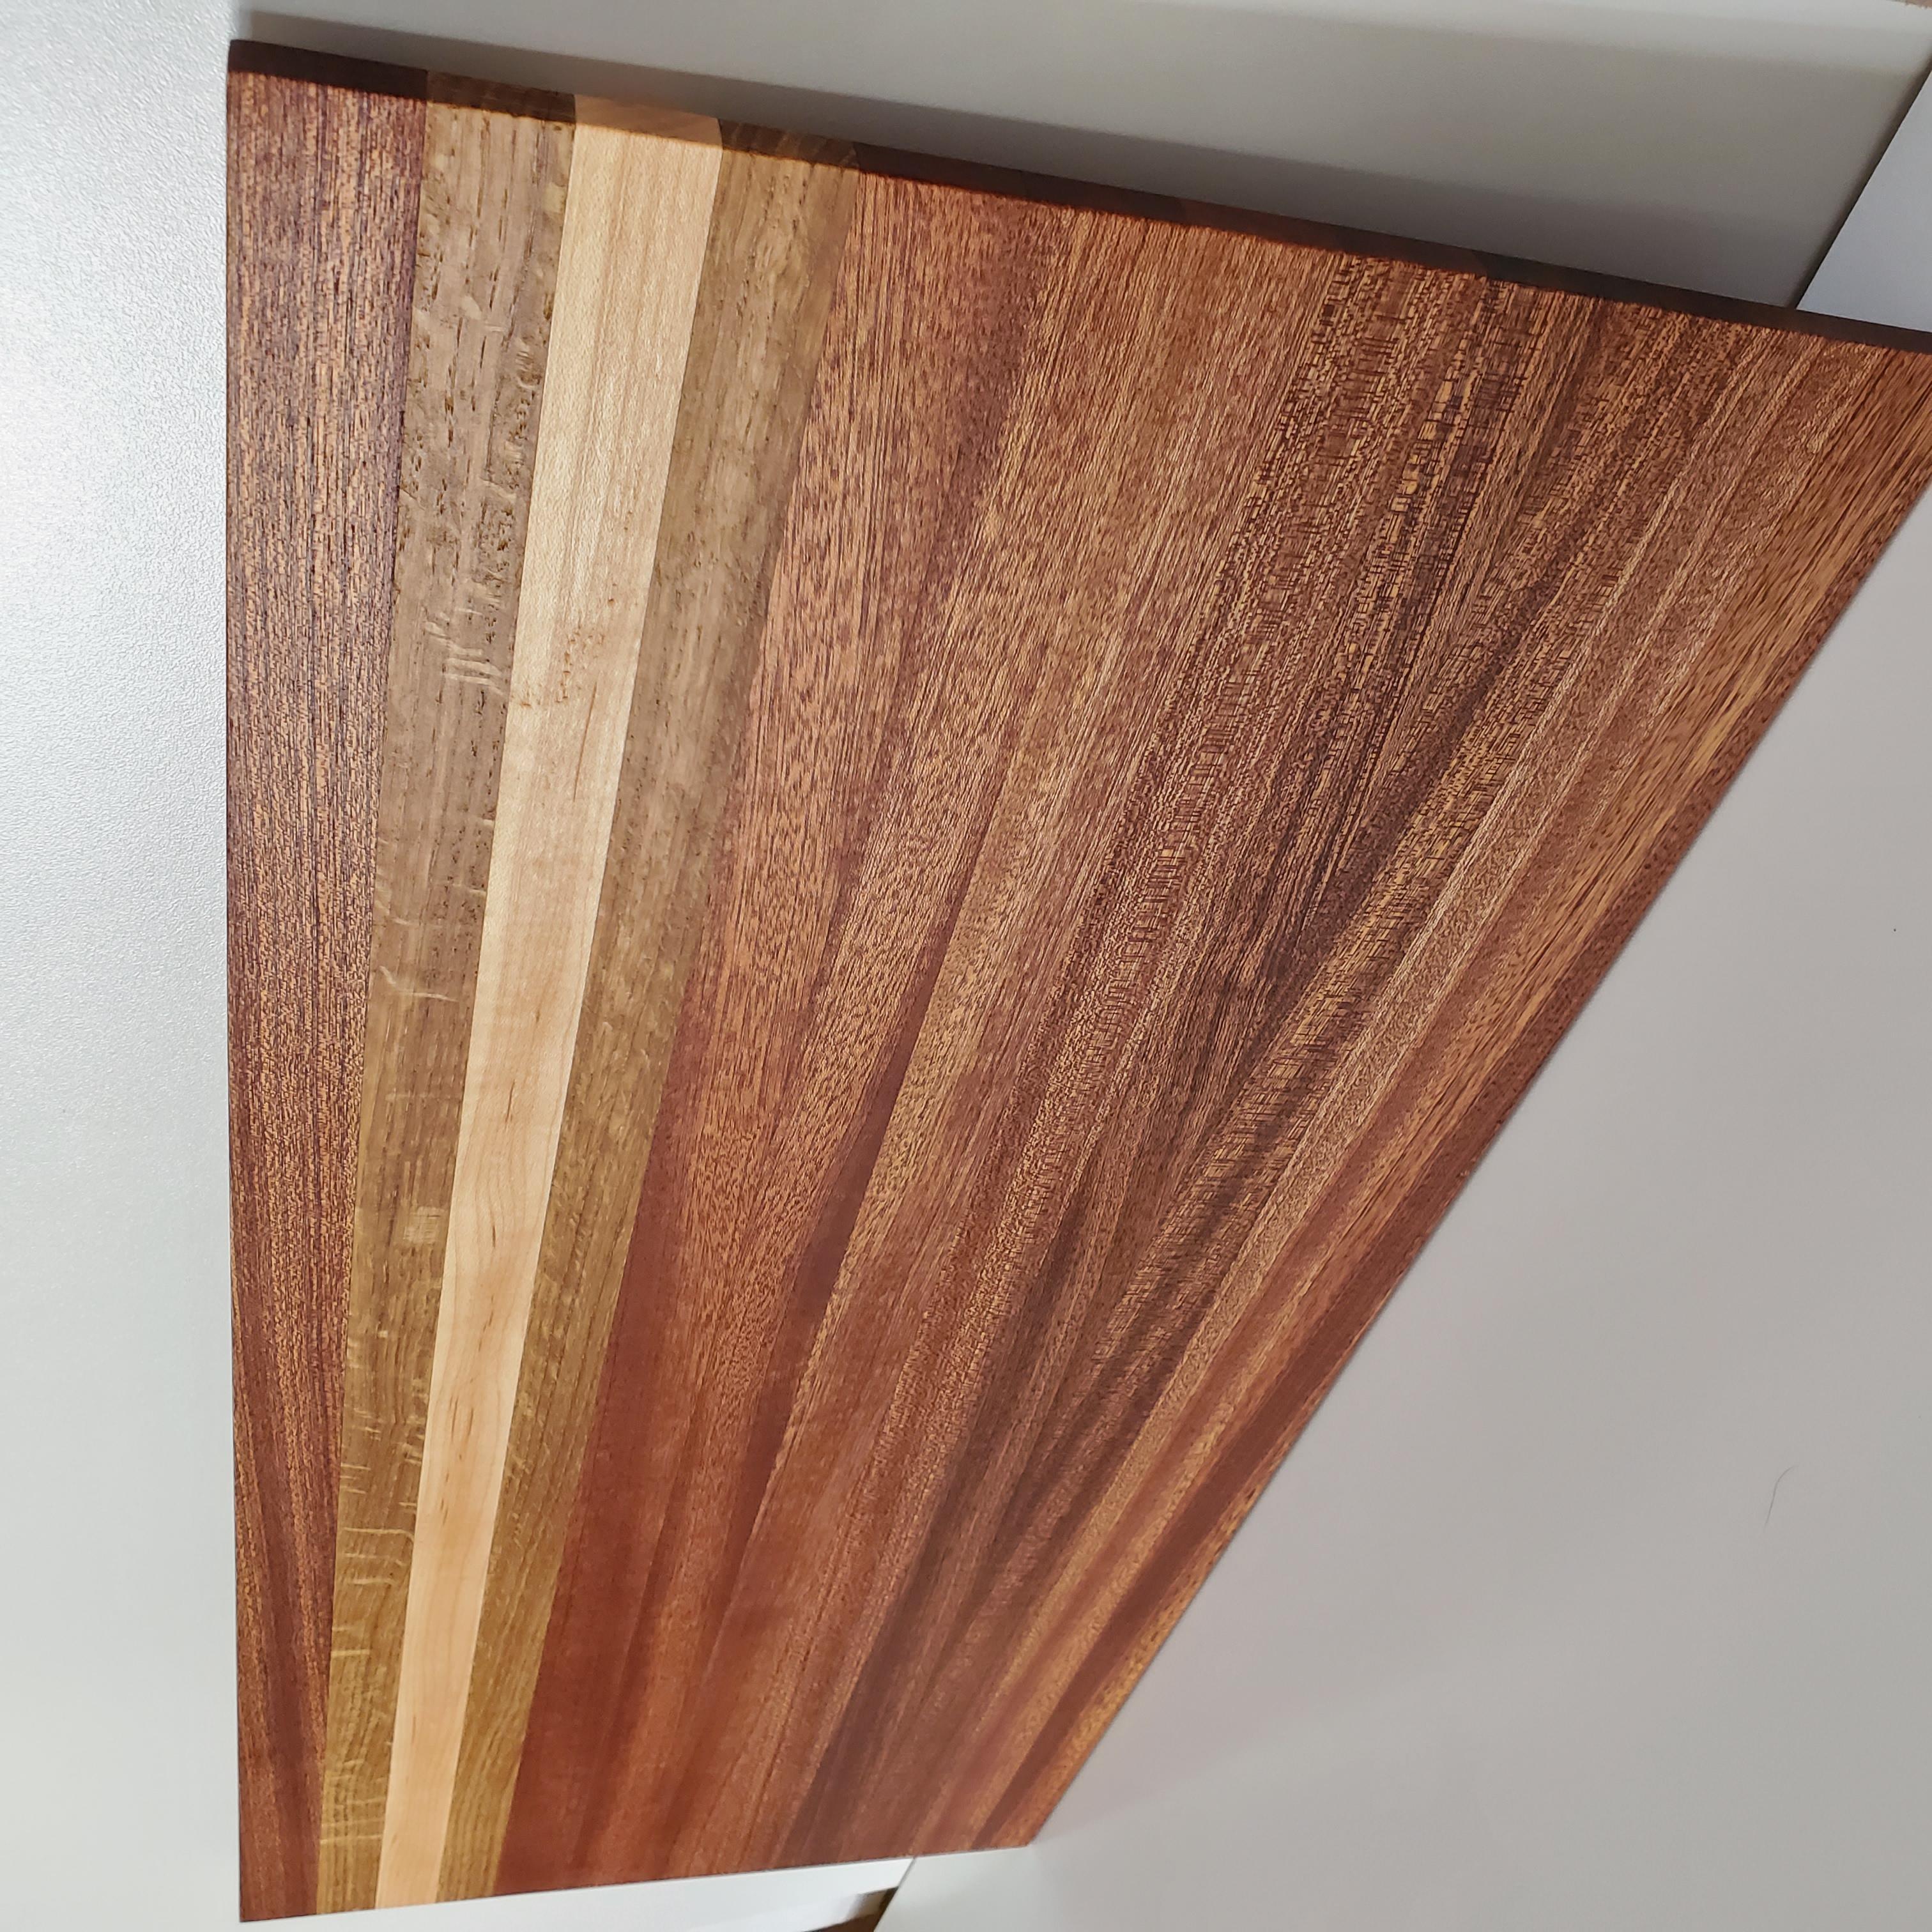 Large Striped Hardwood Cutting Board - Mahogany, Oak & Maple